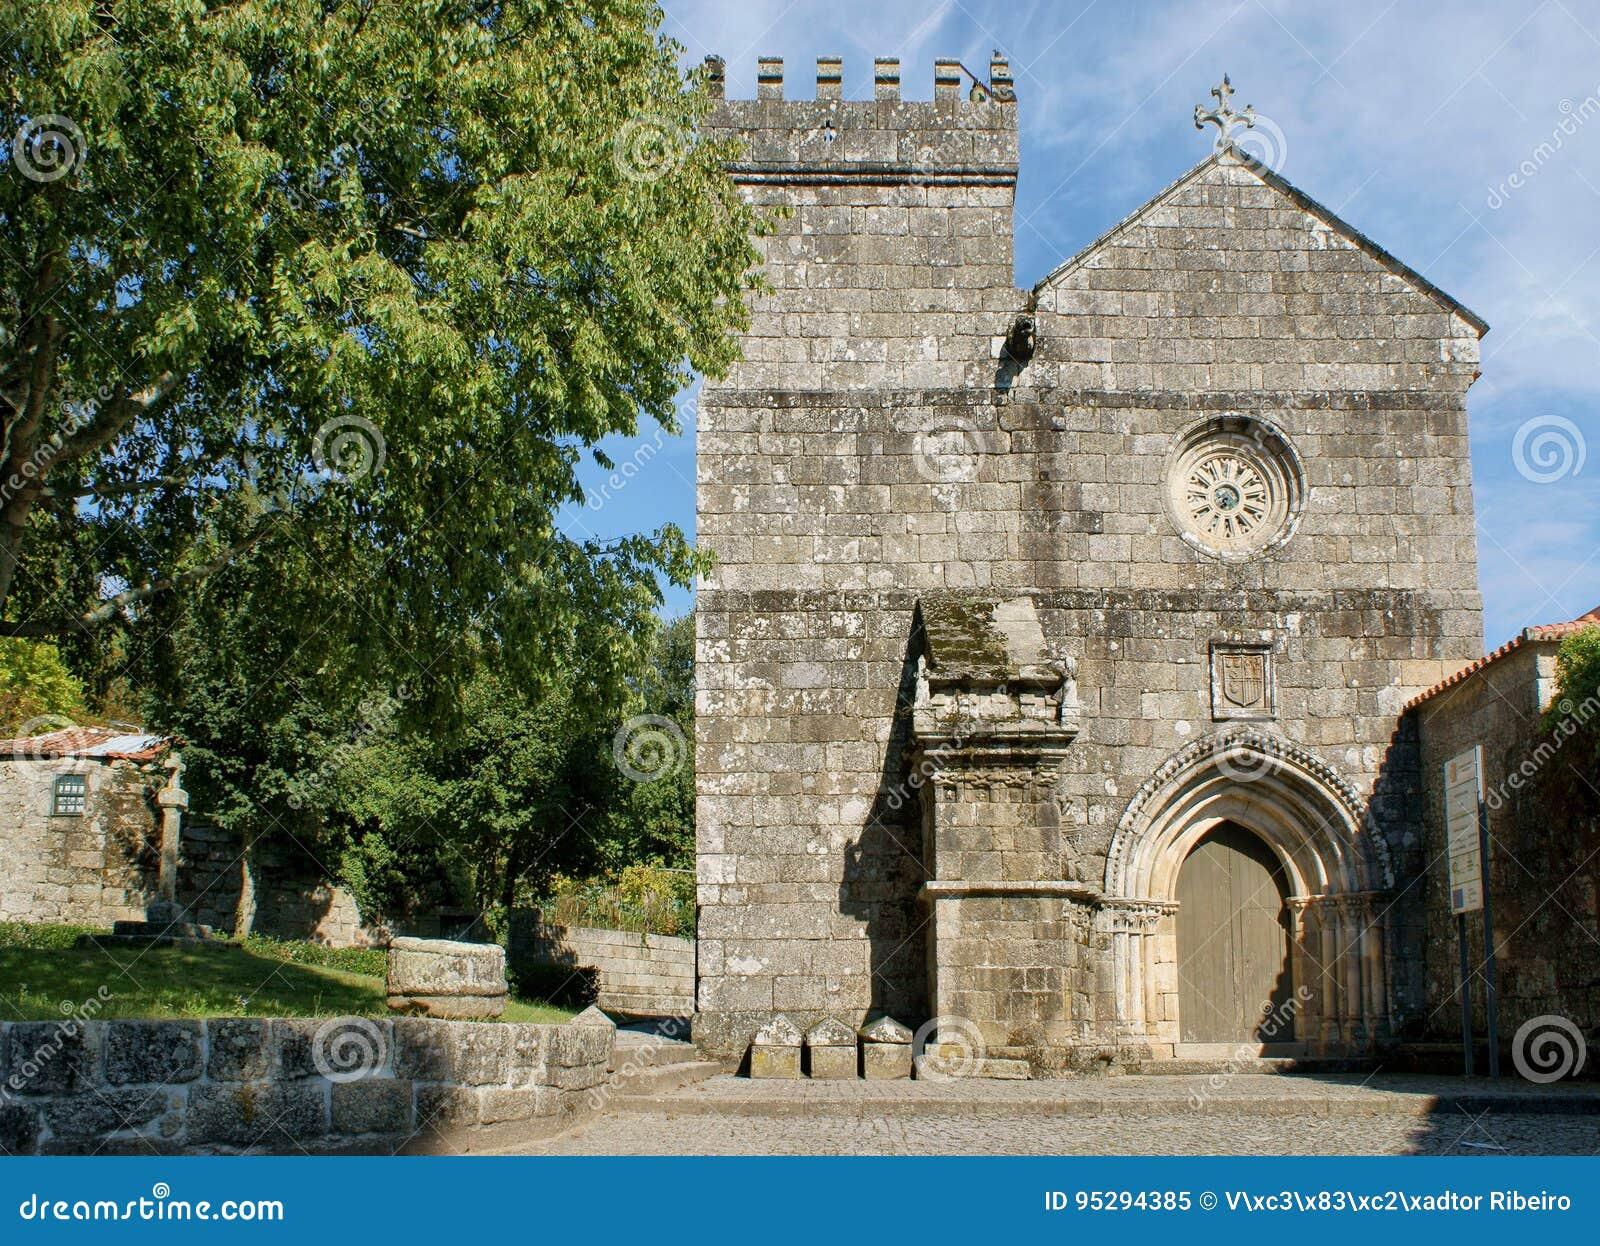 Romanesque monastery of Cete in Parede